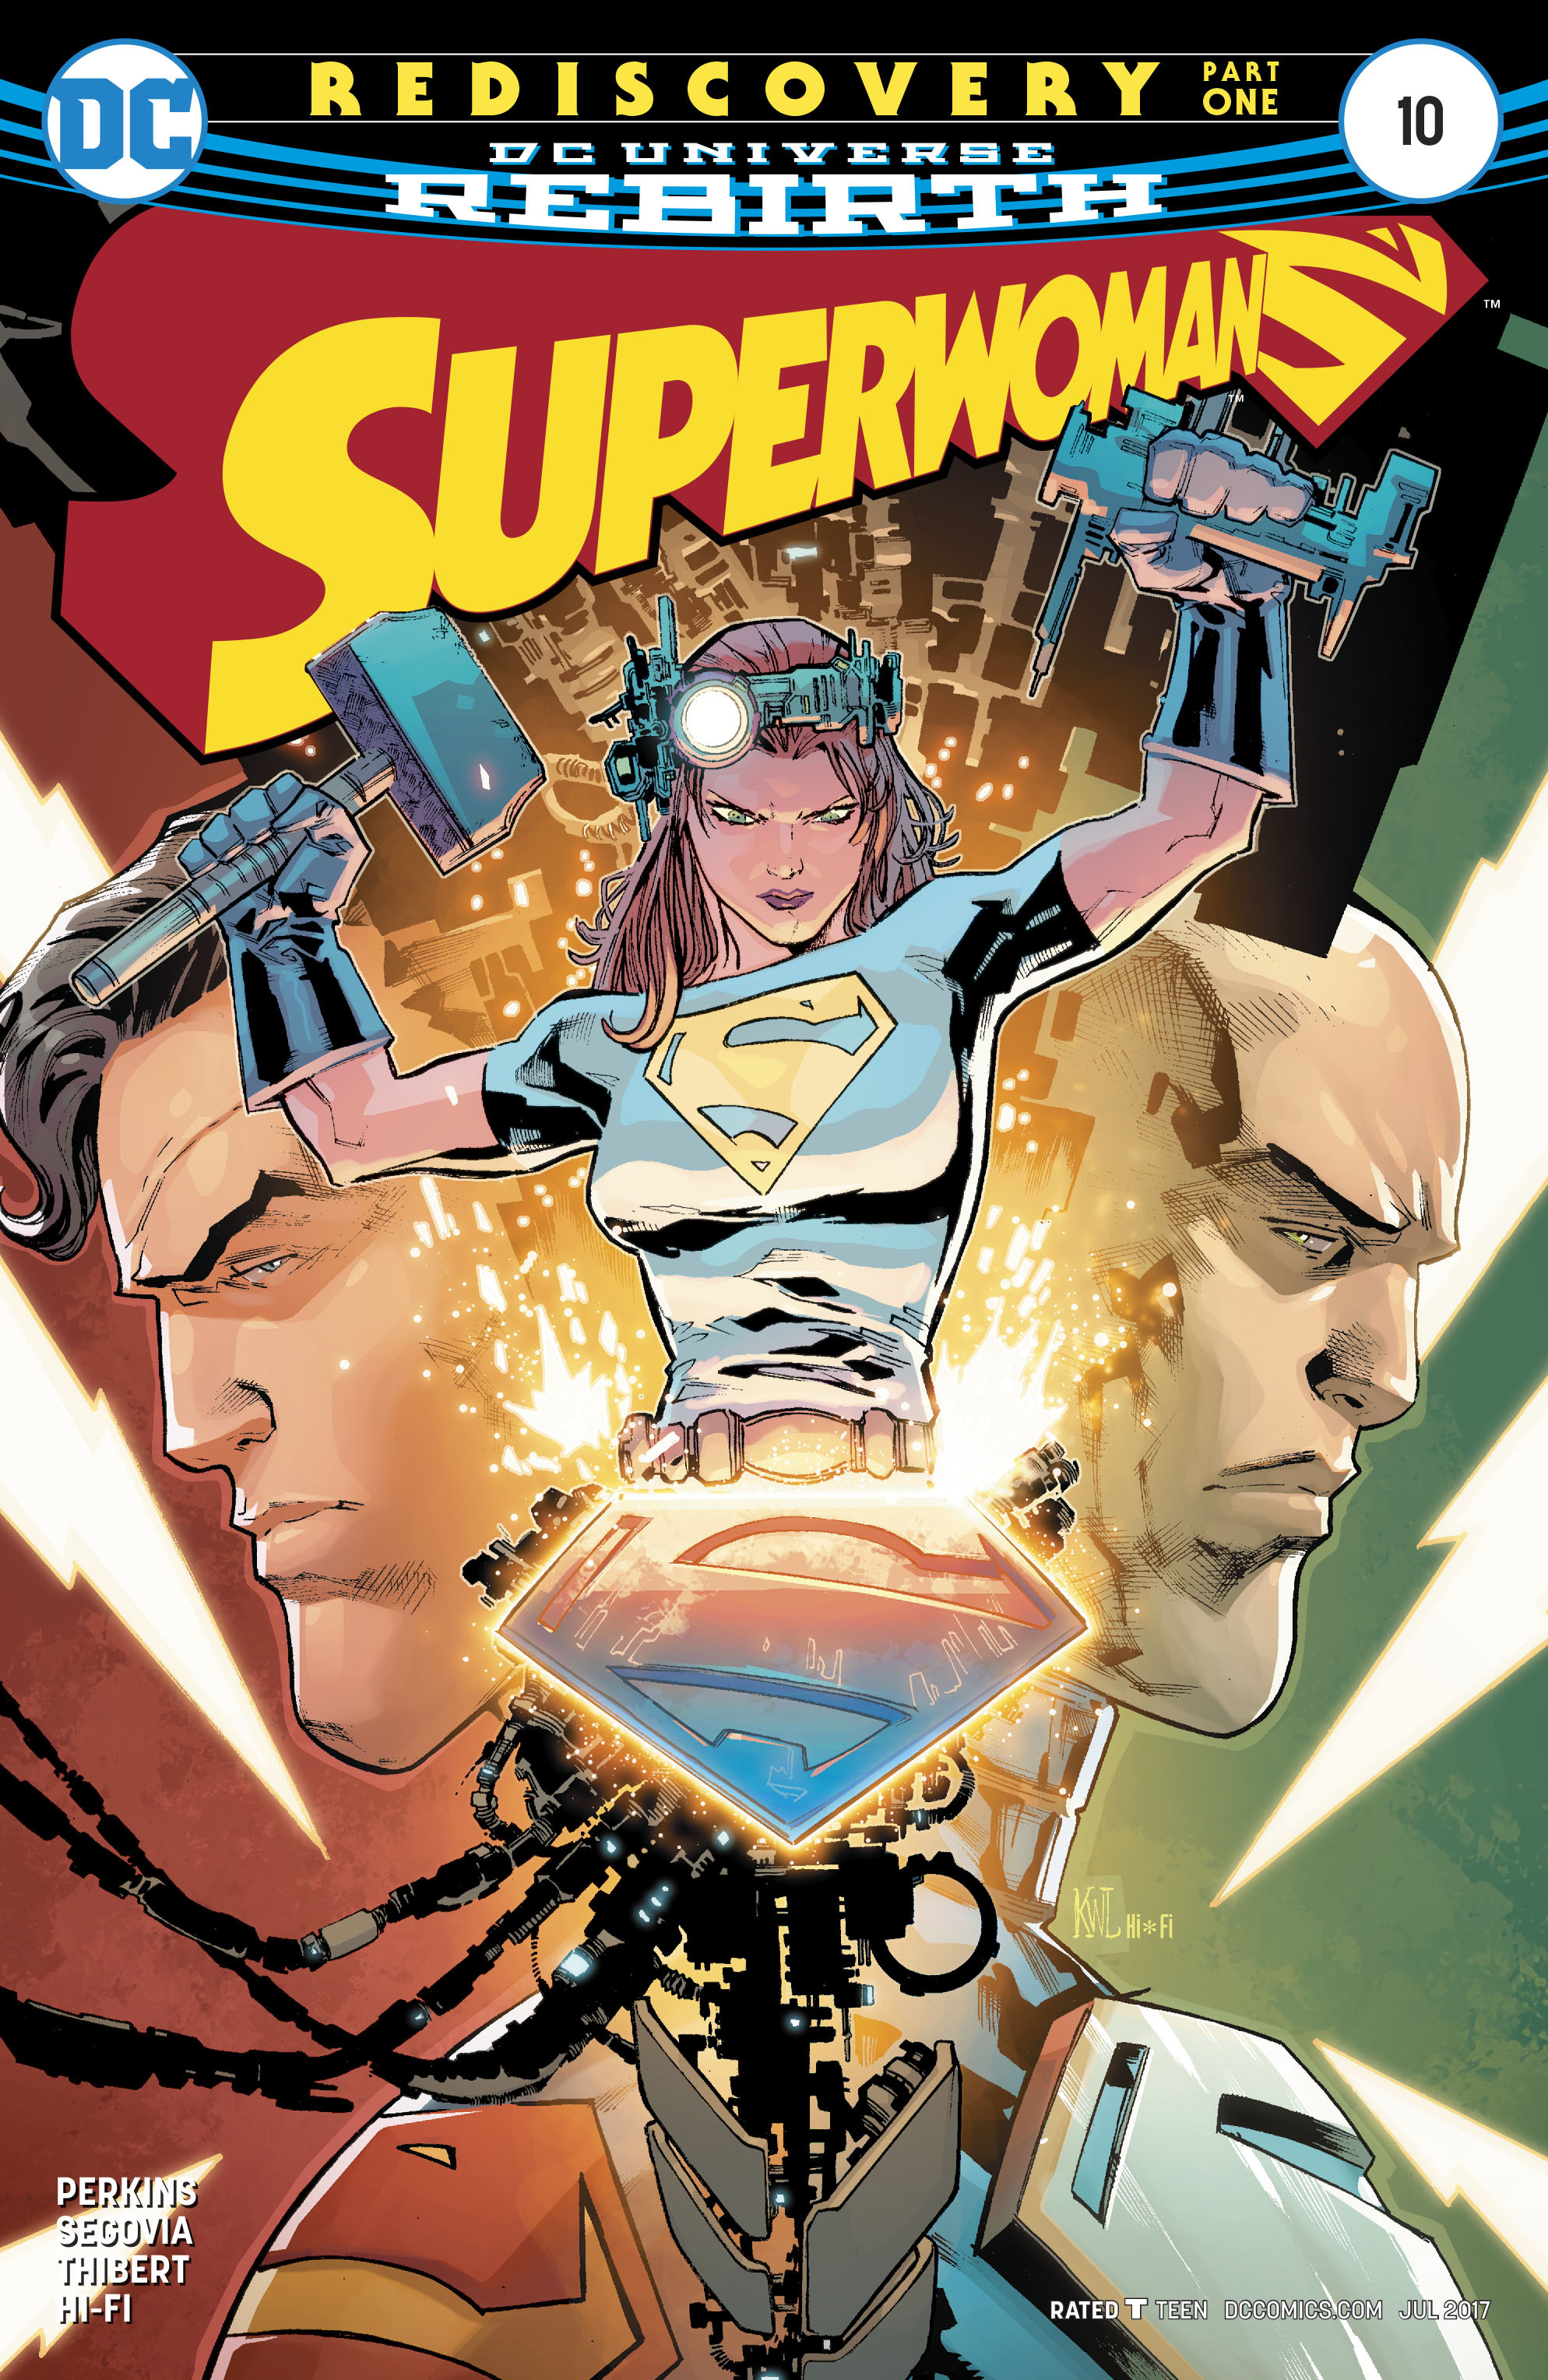 Read online Superwoman comic -  Issue #10 - 1